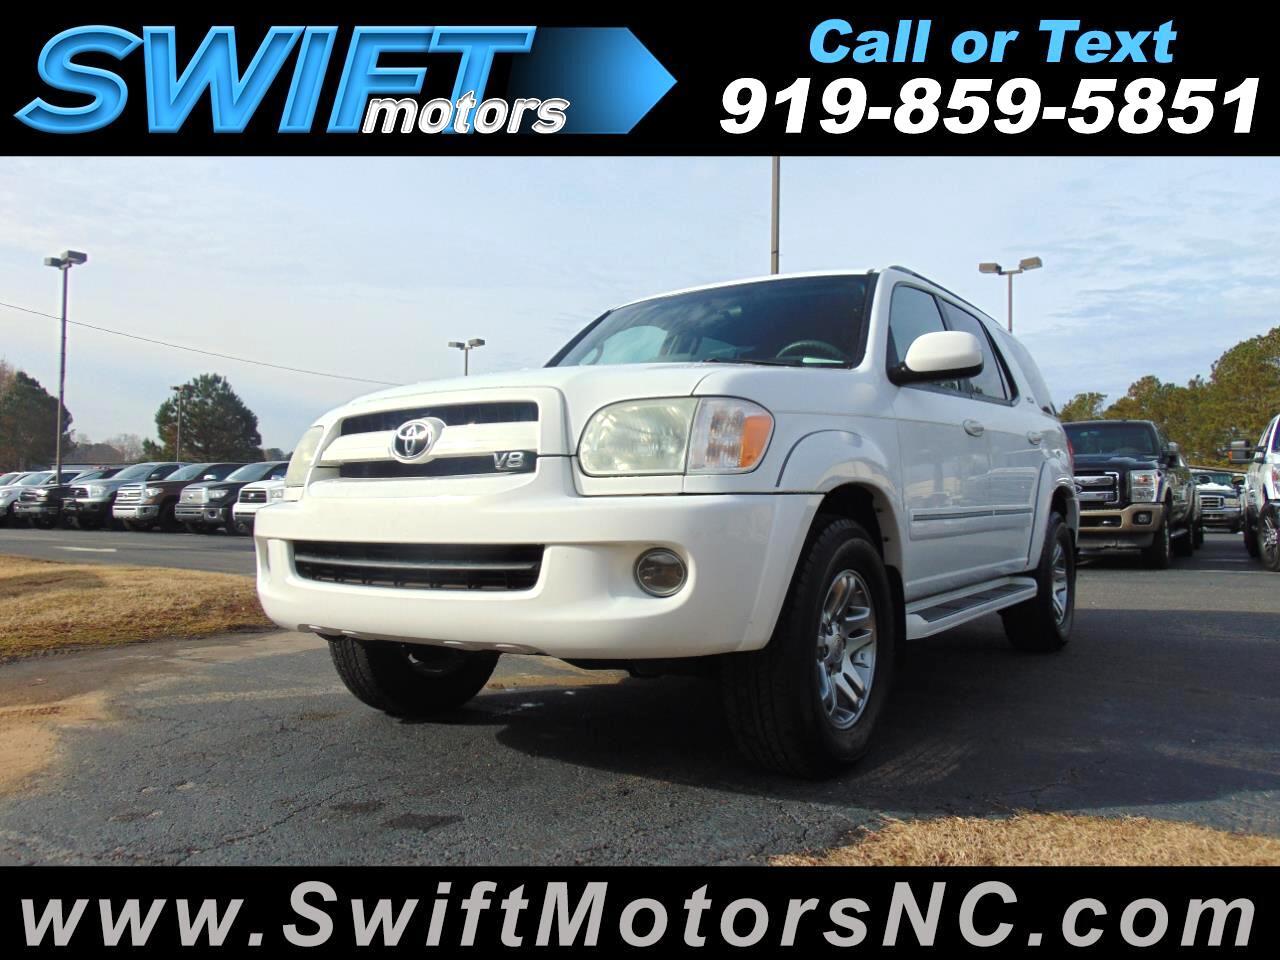 2007 Toyota Sequoia 2WD 4dr SR5 (Natl)